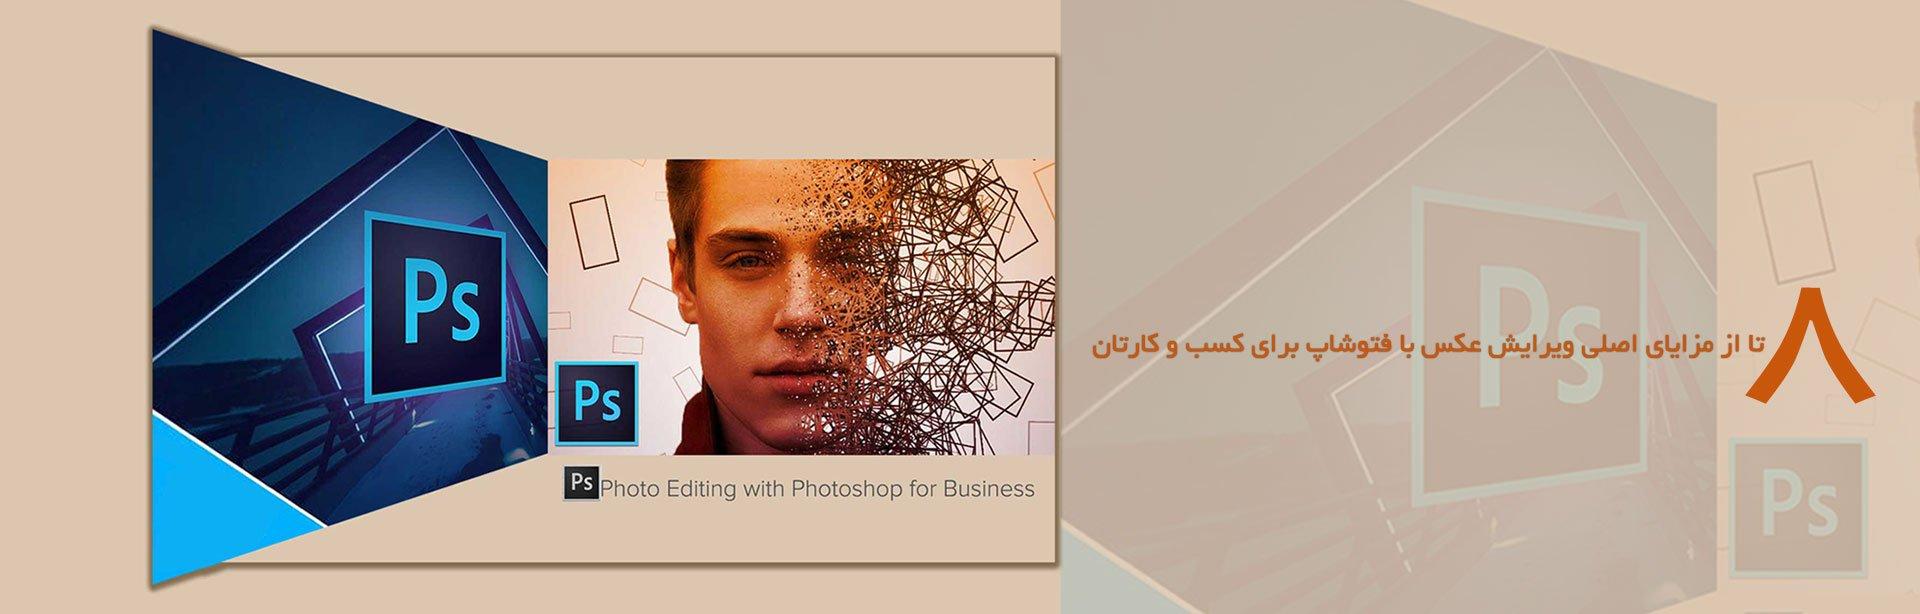 Photo editing  Photoshop 2 2 - 8 تا از مزایای اصلی ویرایش عکس با فتوشاپ برای کسب و کارتان